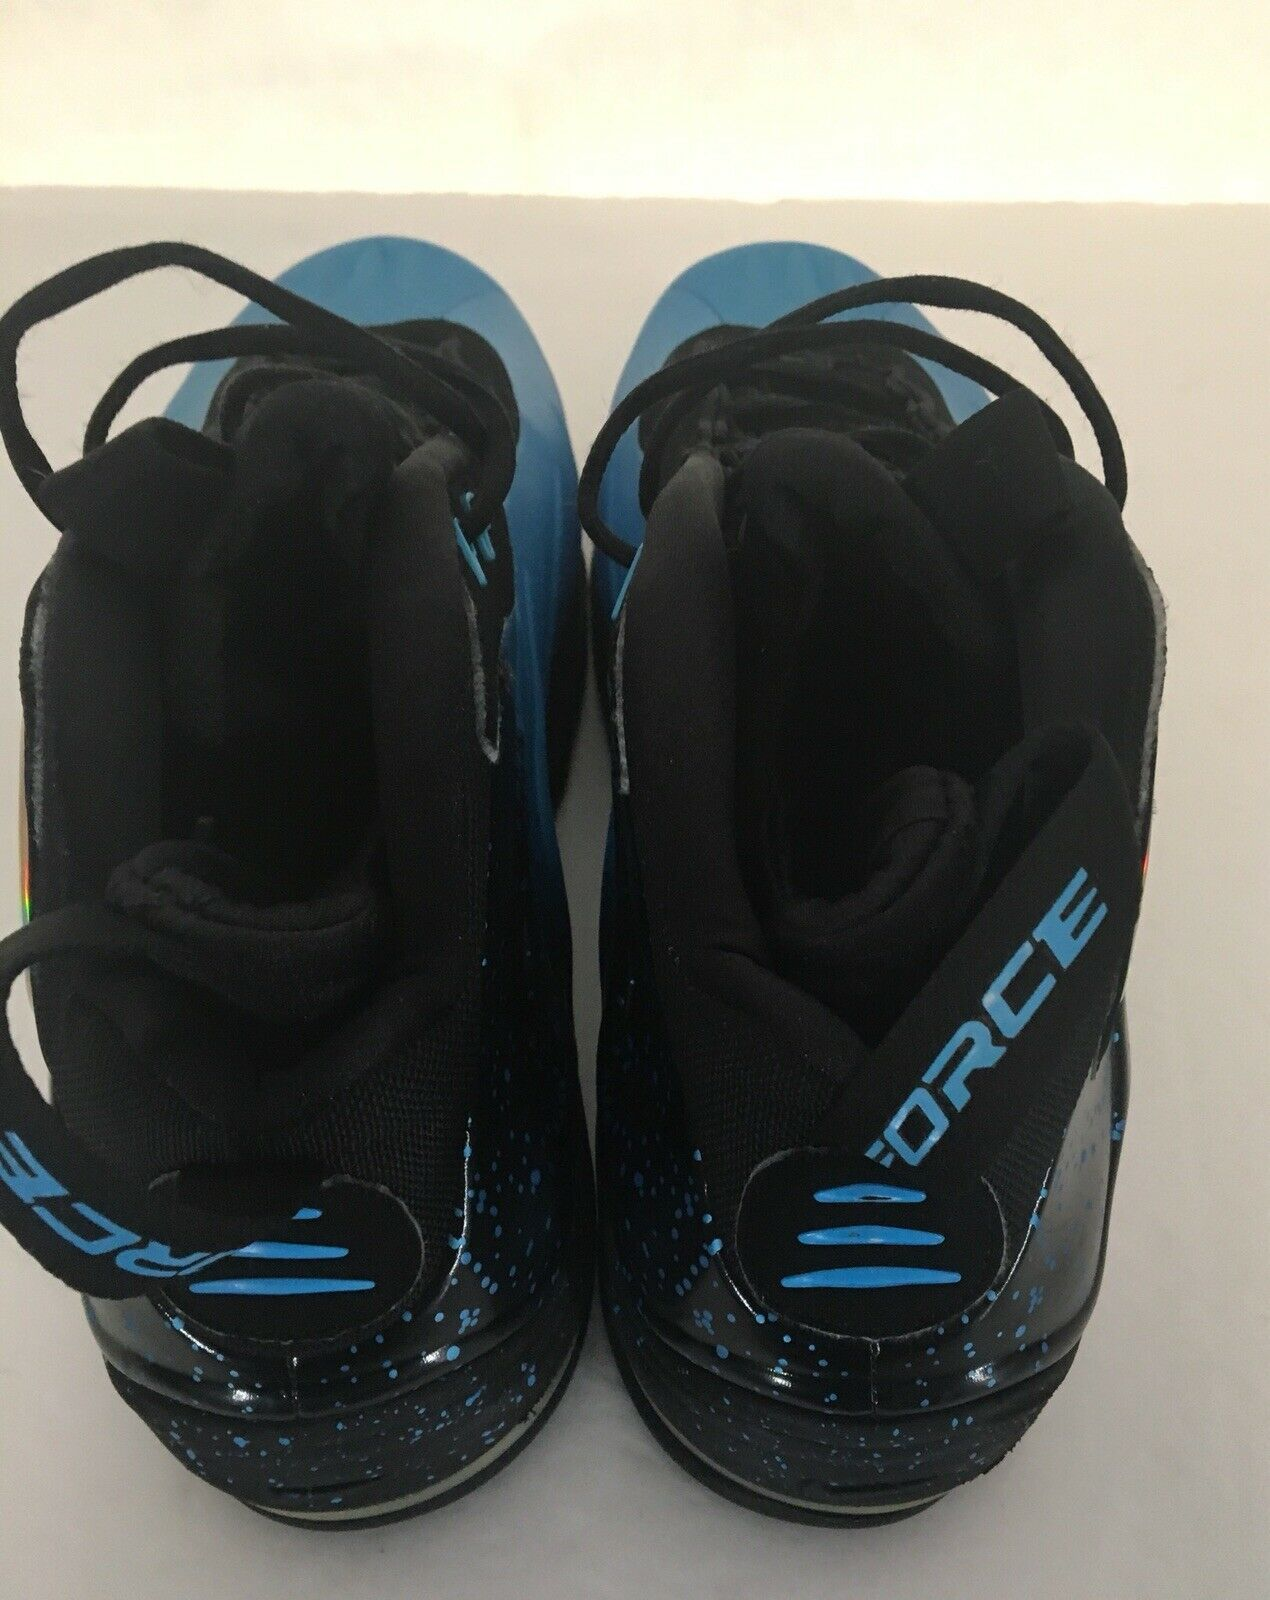 Nike Total Air Max Foamposite Tim Duncan Mens Athletic Basketball Shoes Sz 13 M